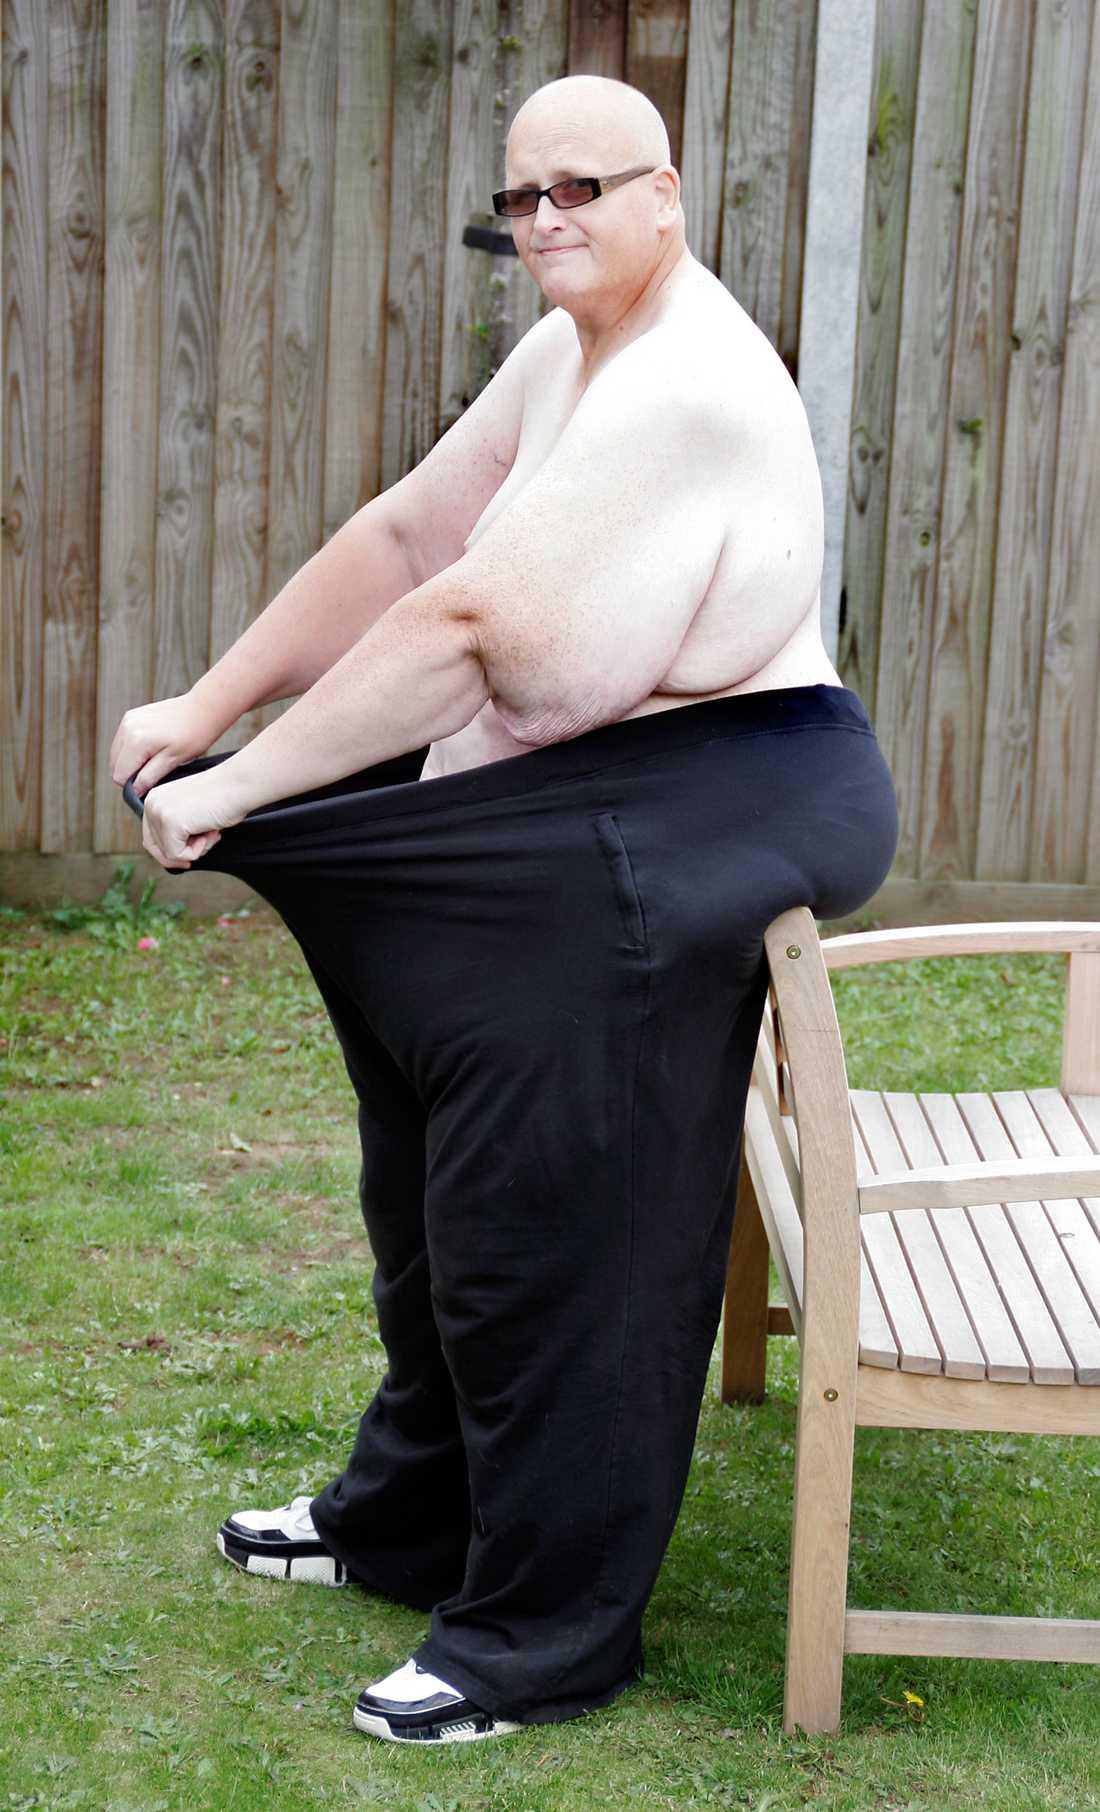 Nu väger han fortfarande över 150 kilo.